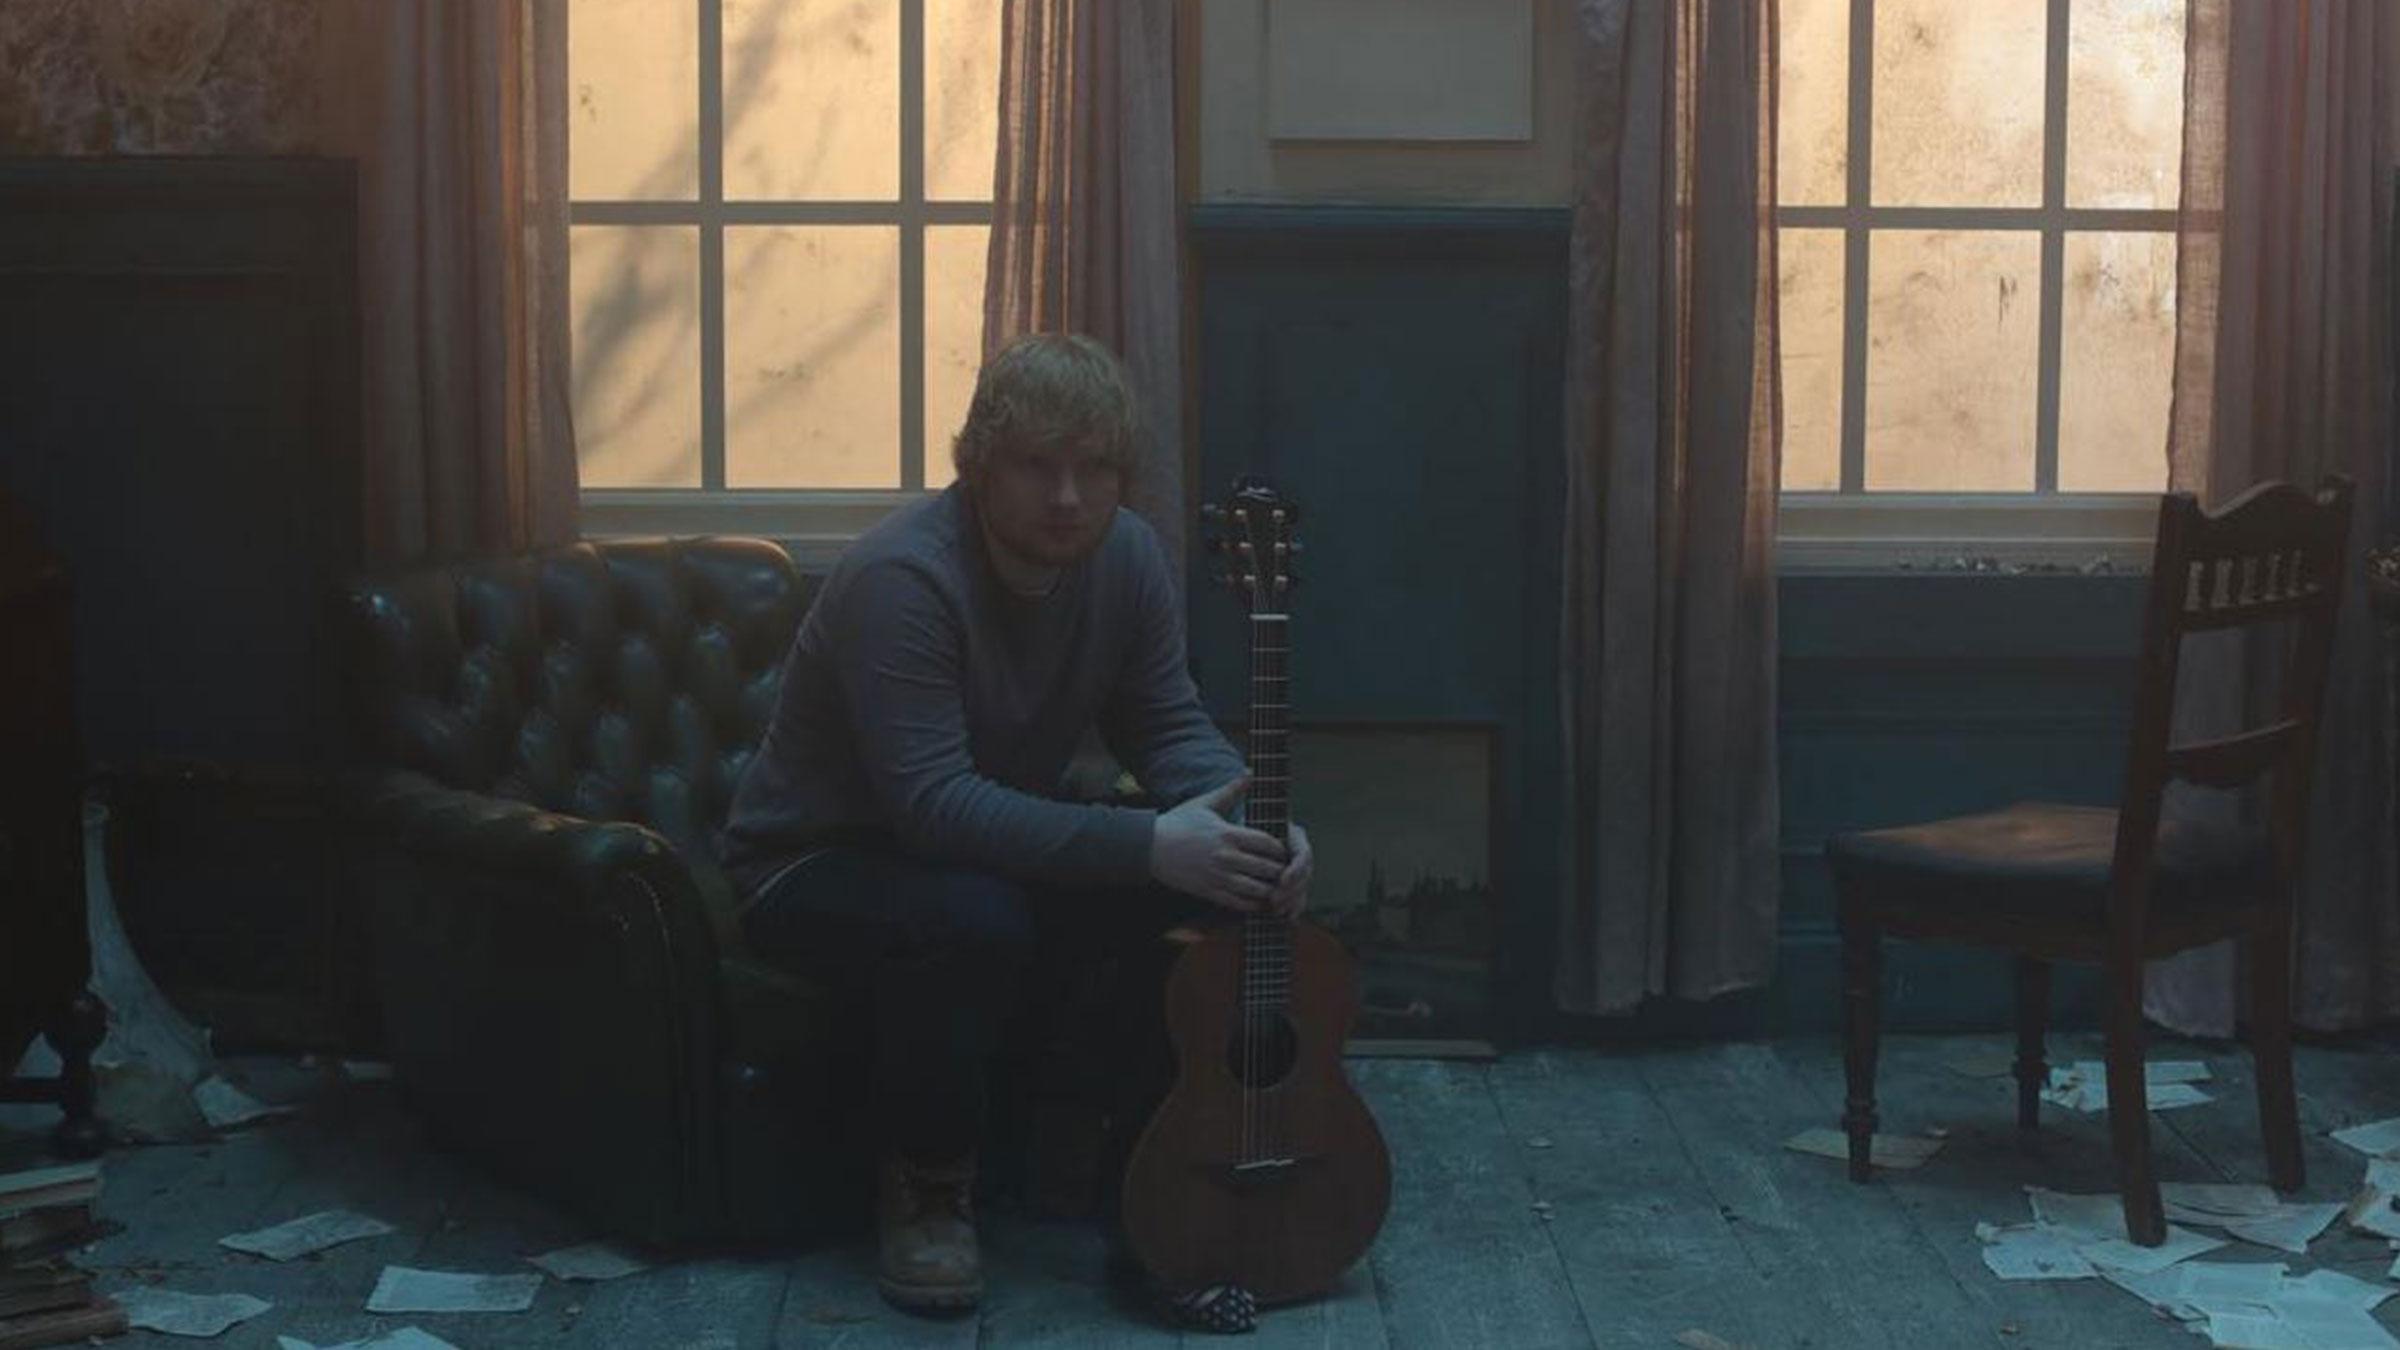 Ed sheeran nieuwe video home